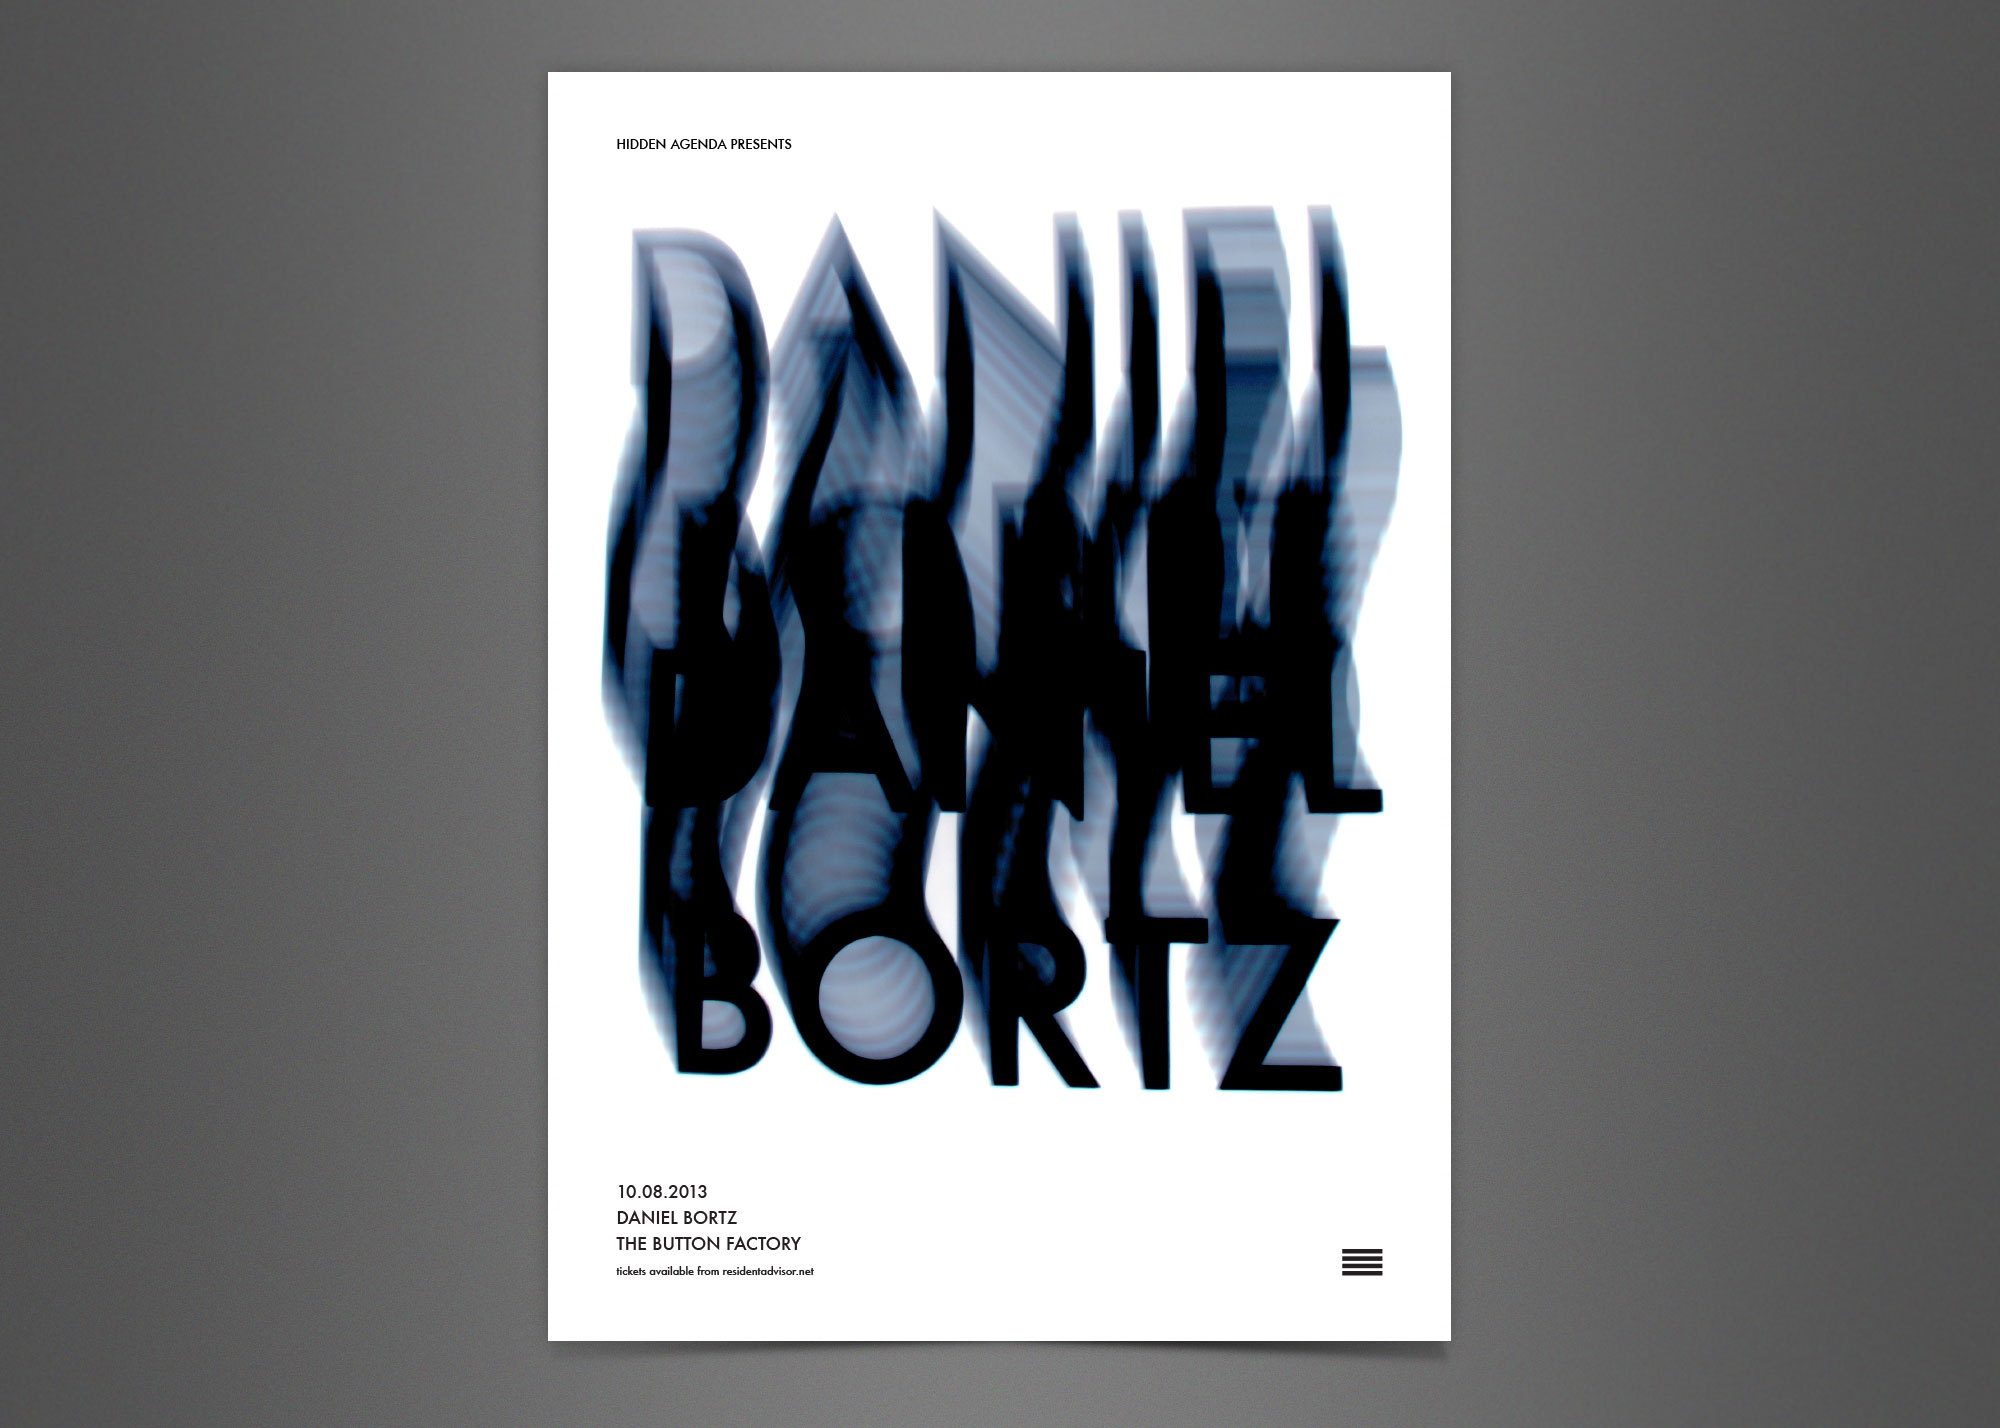 Cover image: Daniel Bortz Poster (2013)